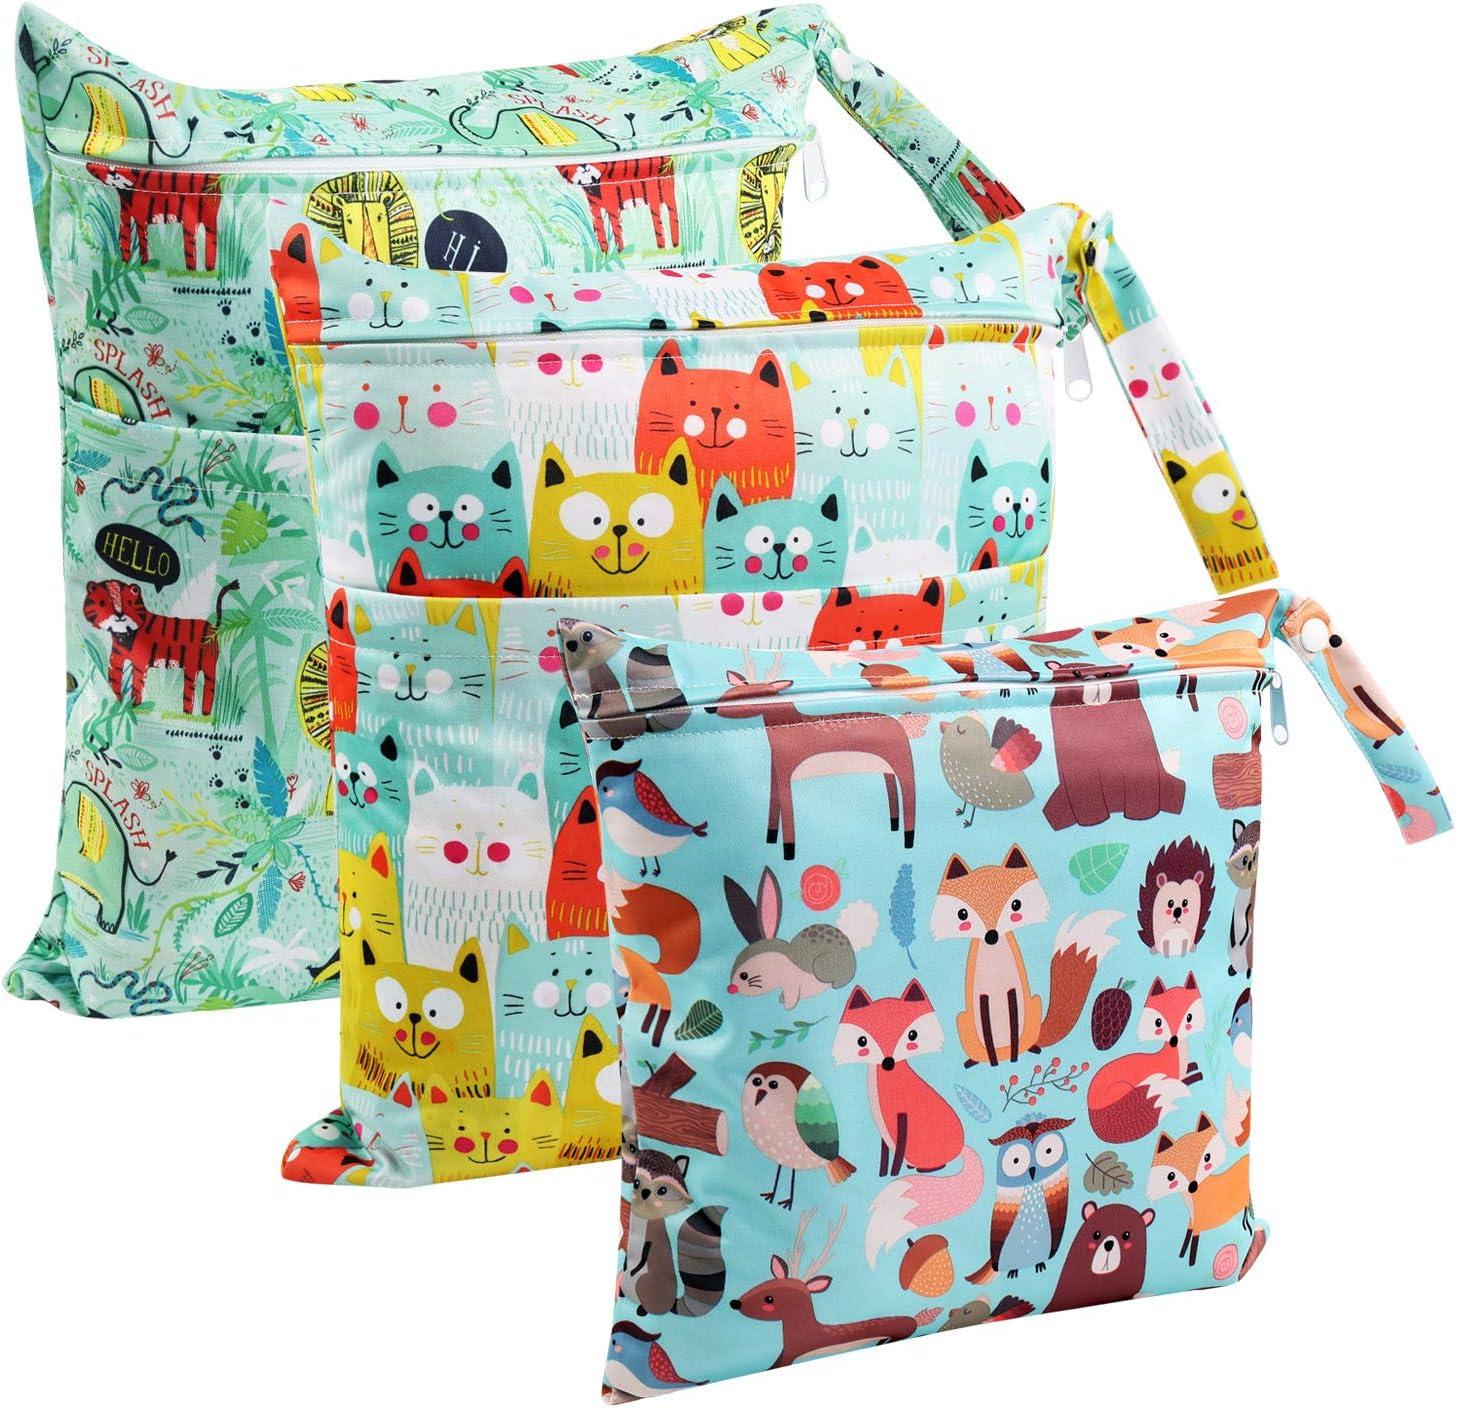 Bolsa de Pañales, BelleStyle 3 Pcs Reutilizable Wetbag, Impermeable Lavable con 2 Cremallera para Mamá de Bebé, Transpirable Portátil Organizador de Maquillaje de Colgar, Viajes, Playa, Piscina, Gym